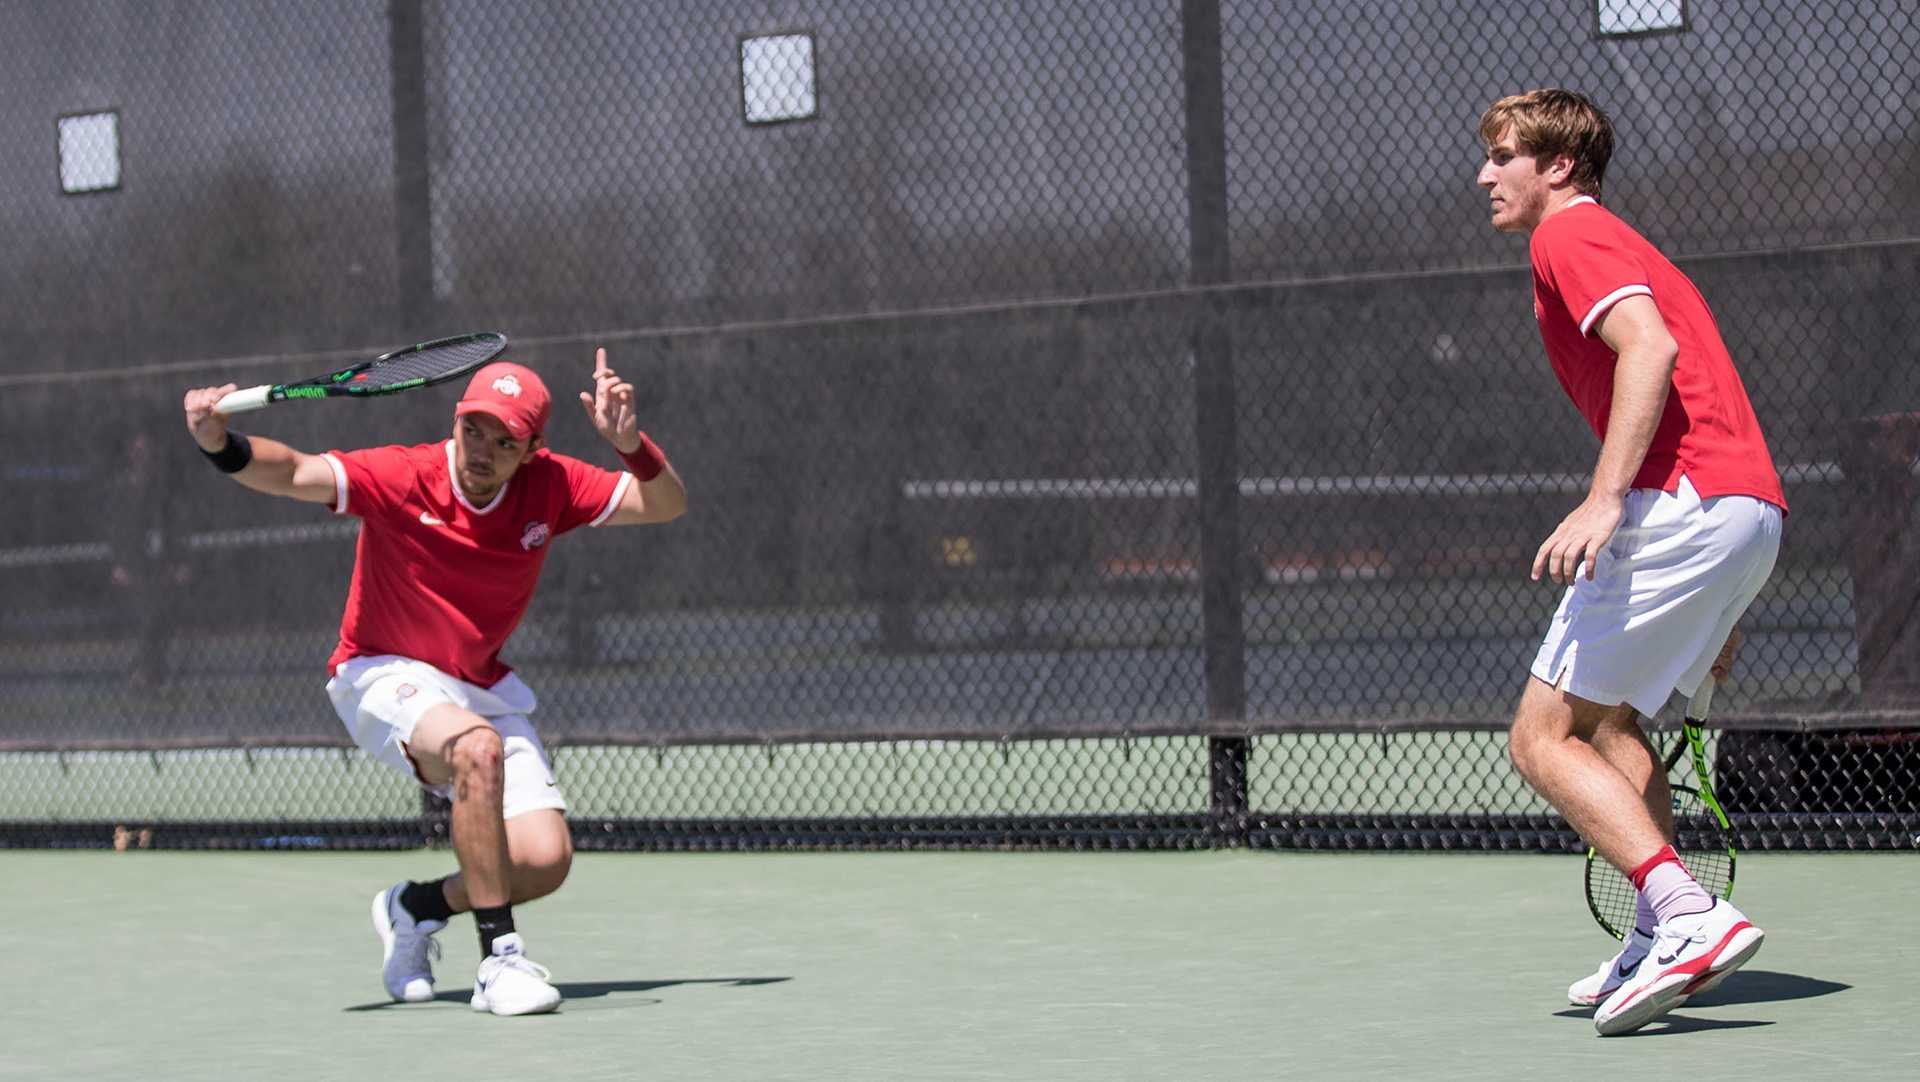 Photos: Big Ten men's tennis conference final